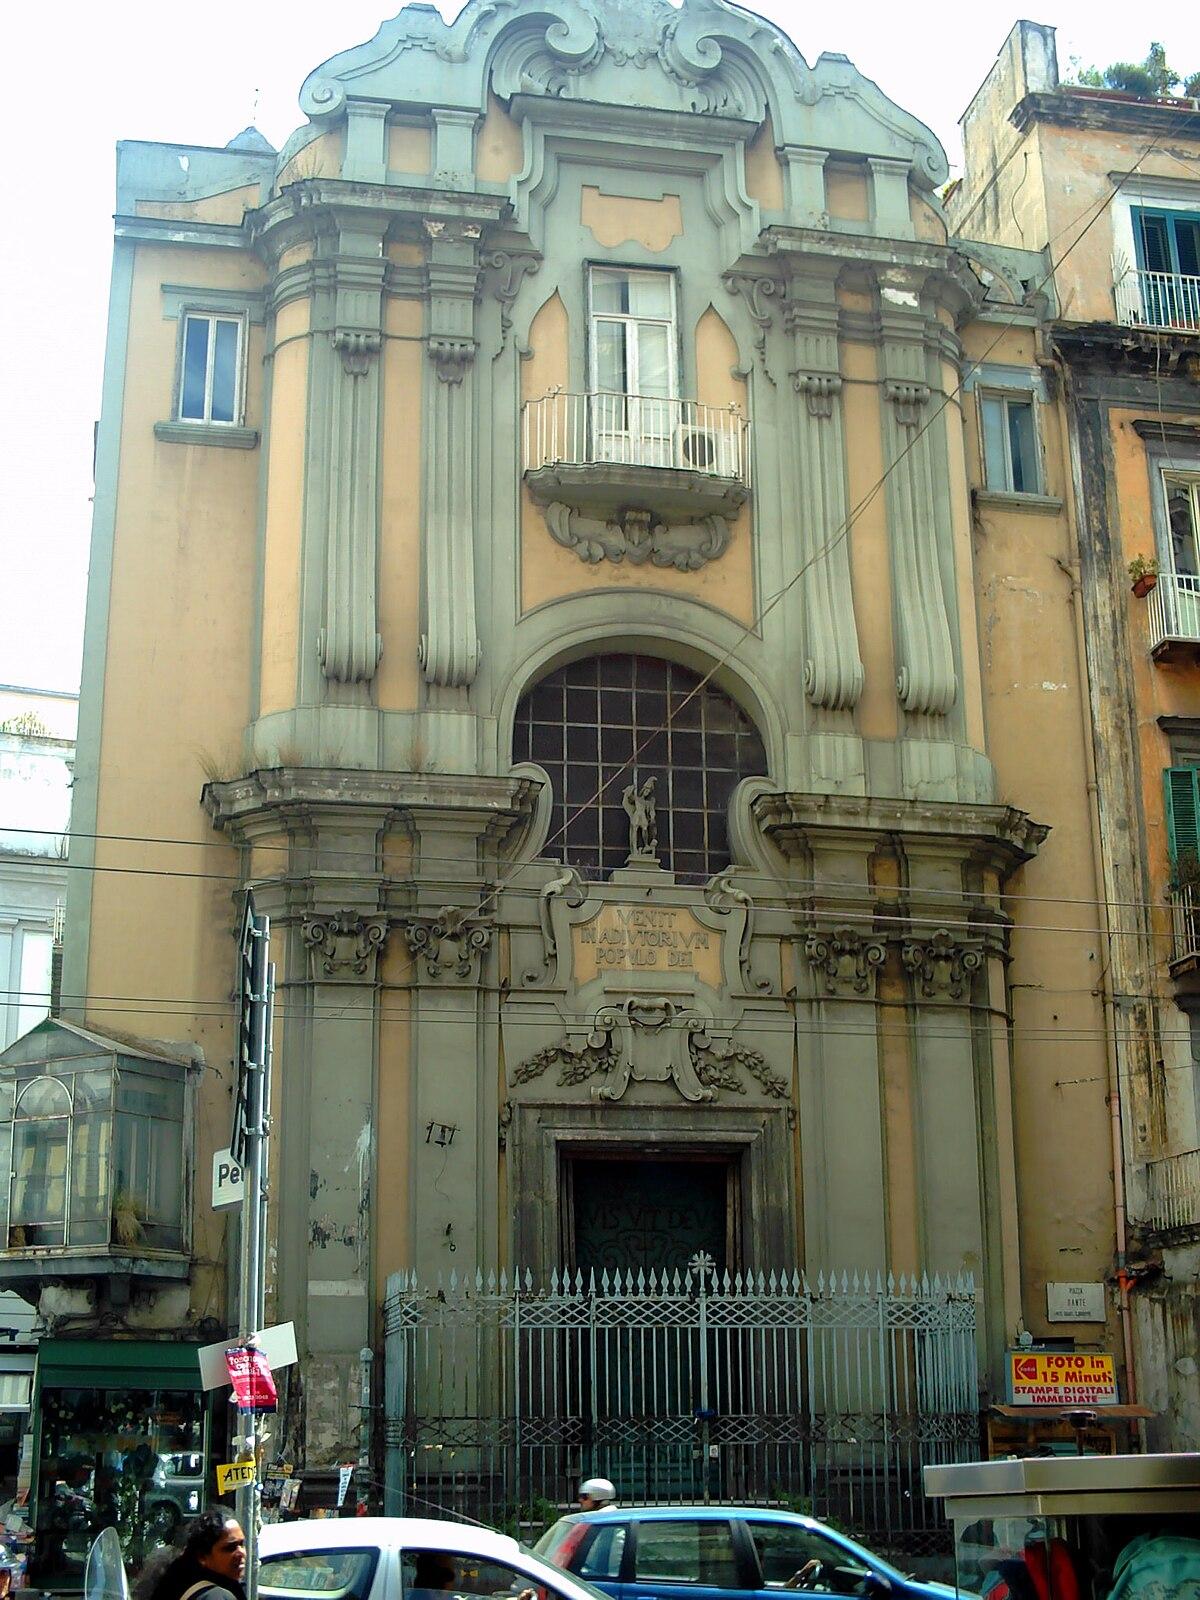 Chiesa di San Michele Arcangelo Napoli  Wikipedia